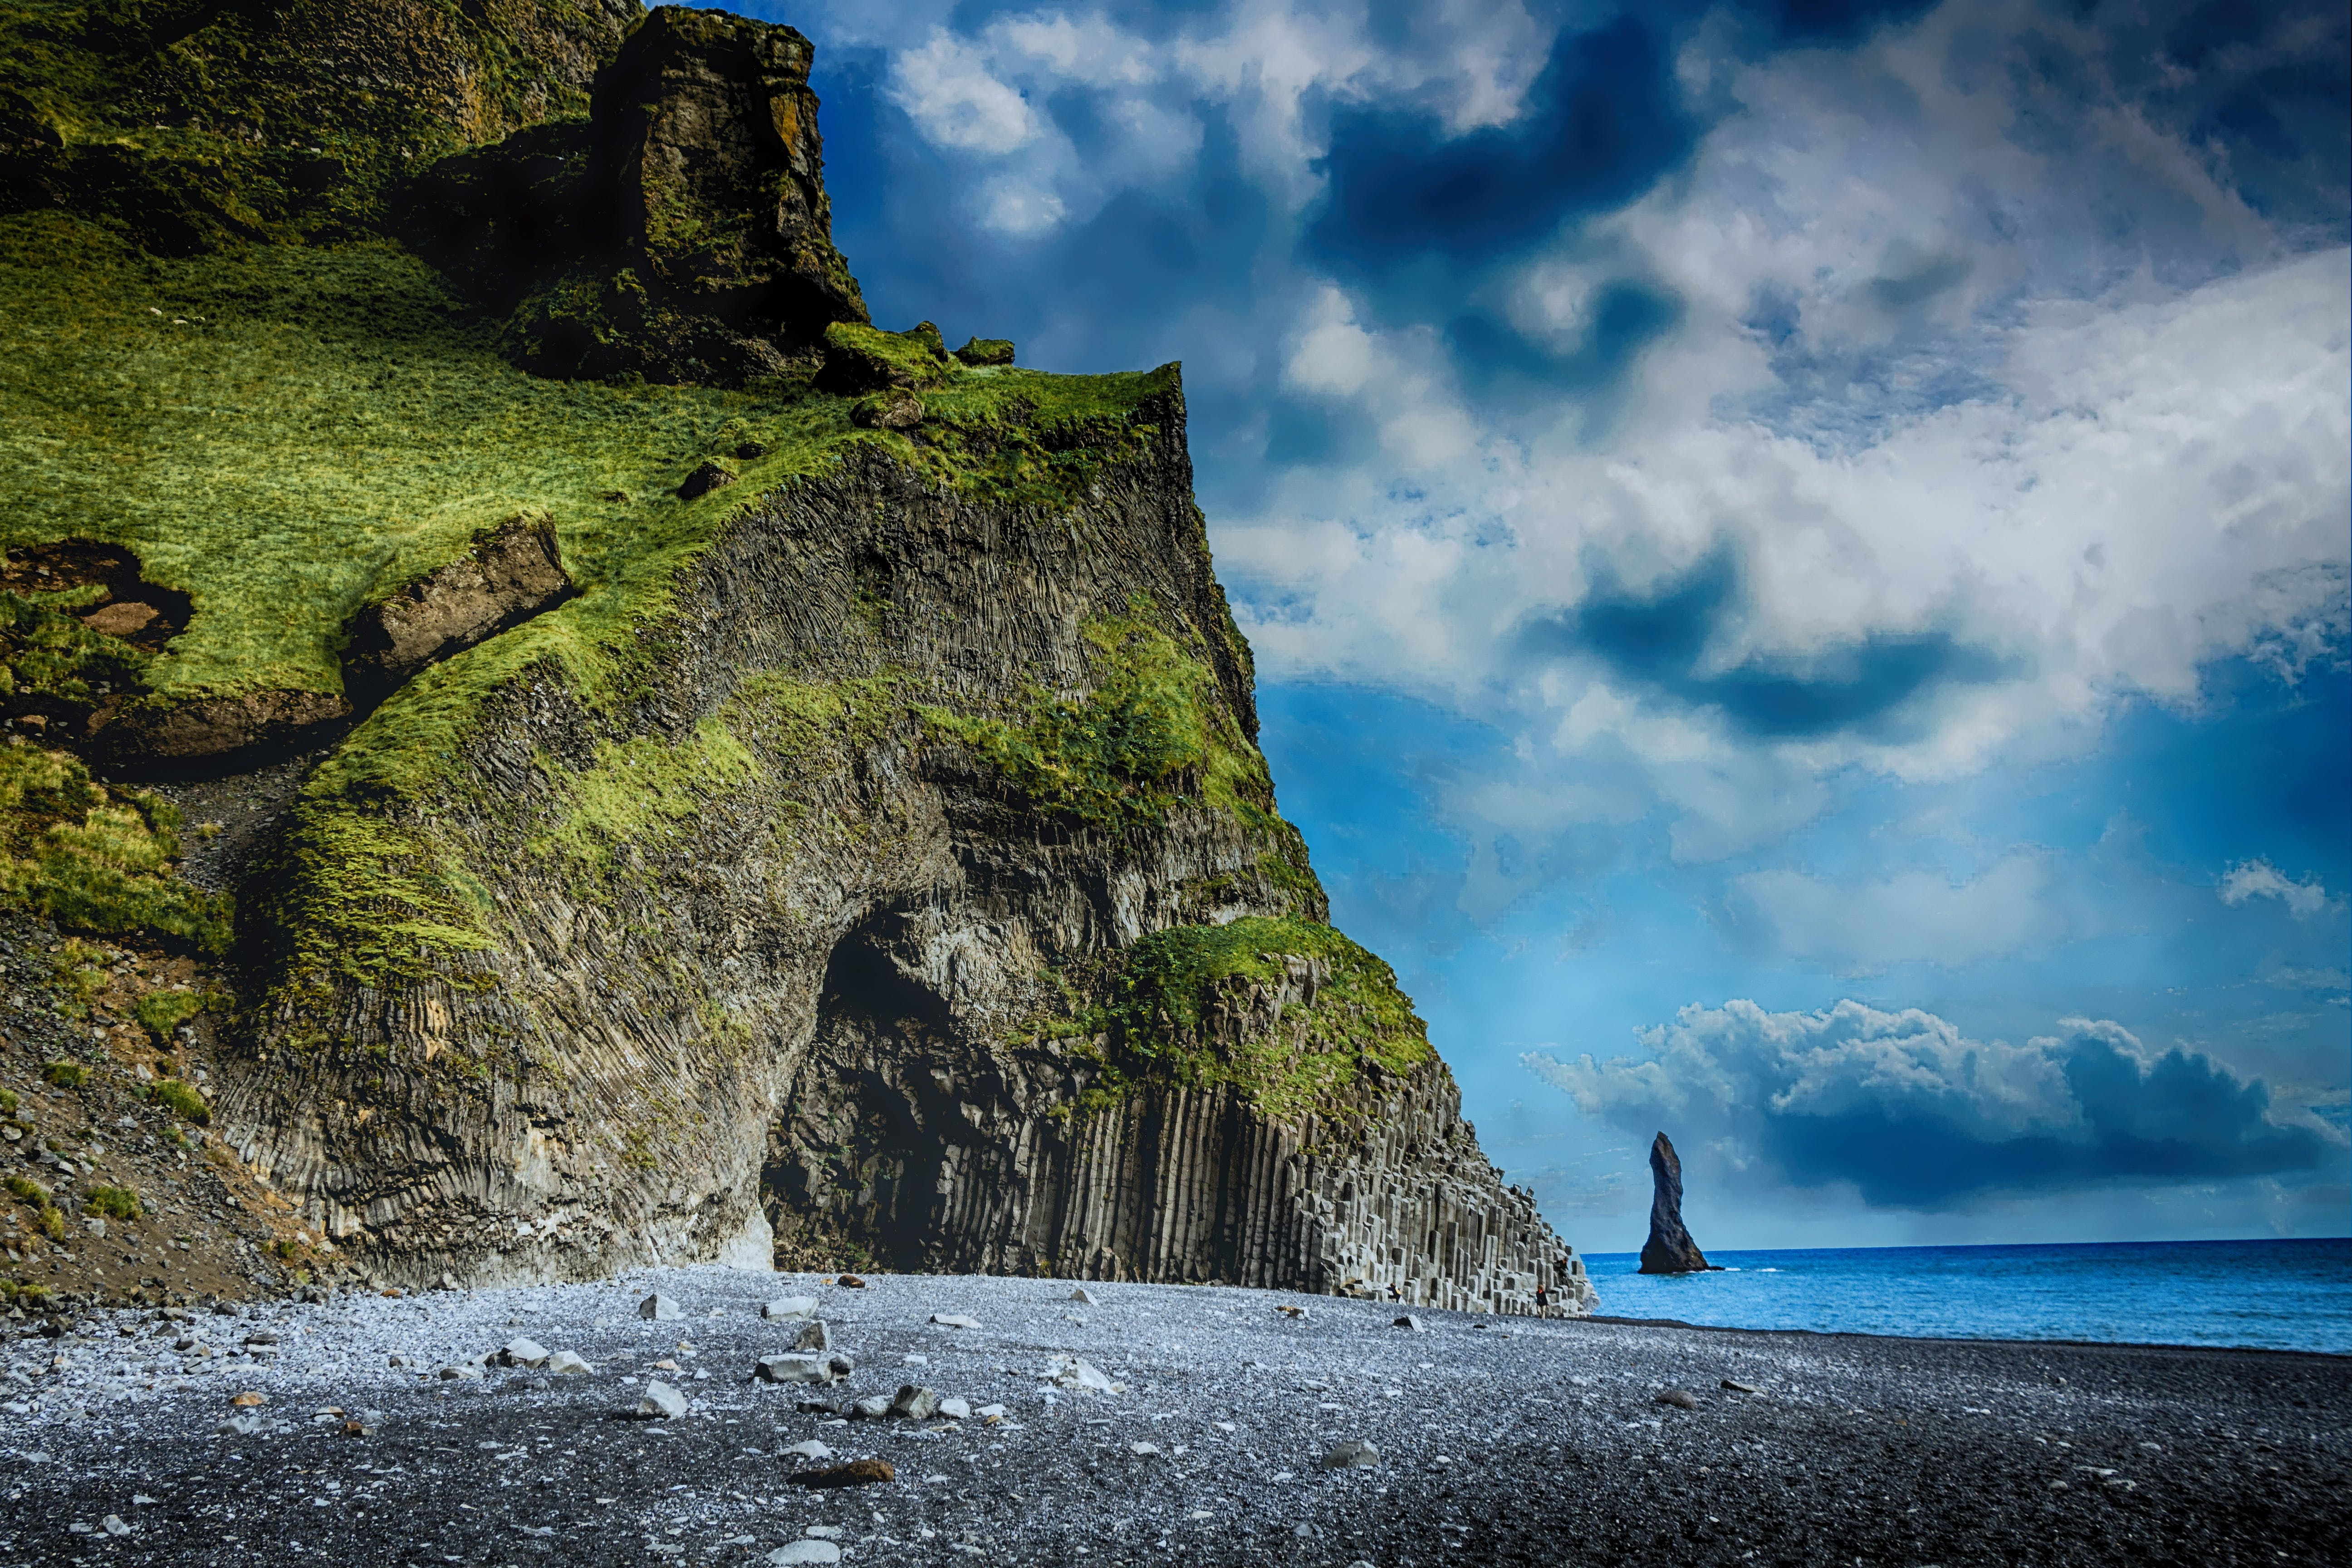 Rock Formation Beside Shoreline